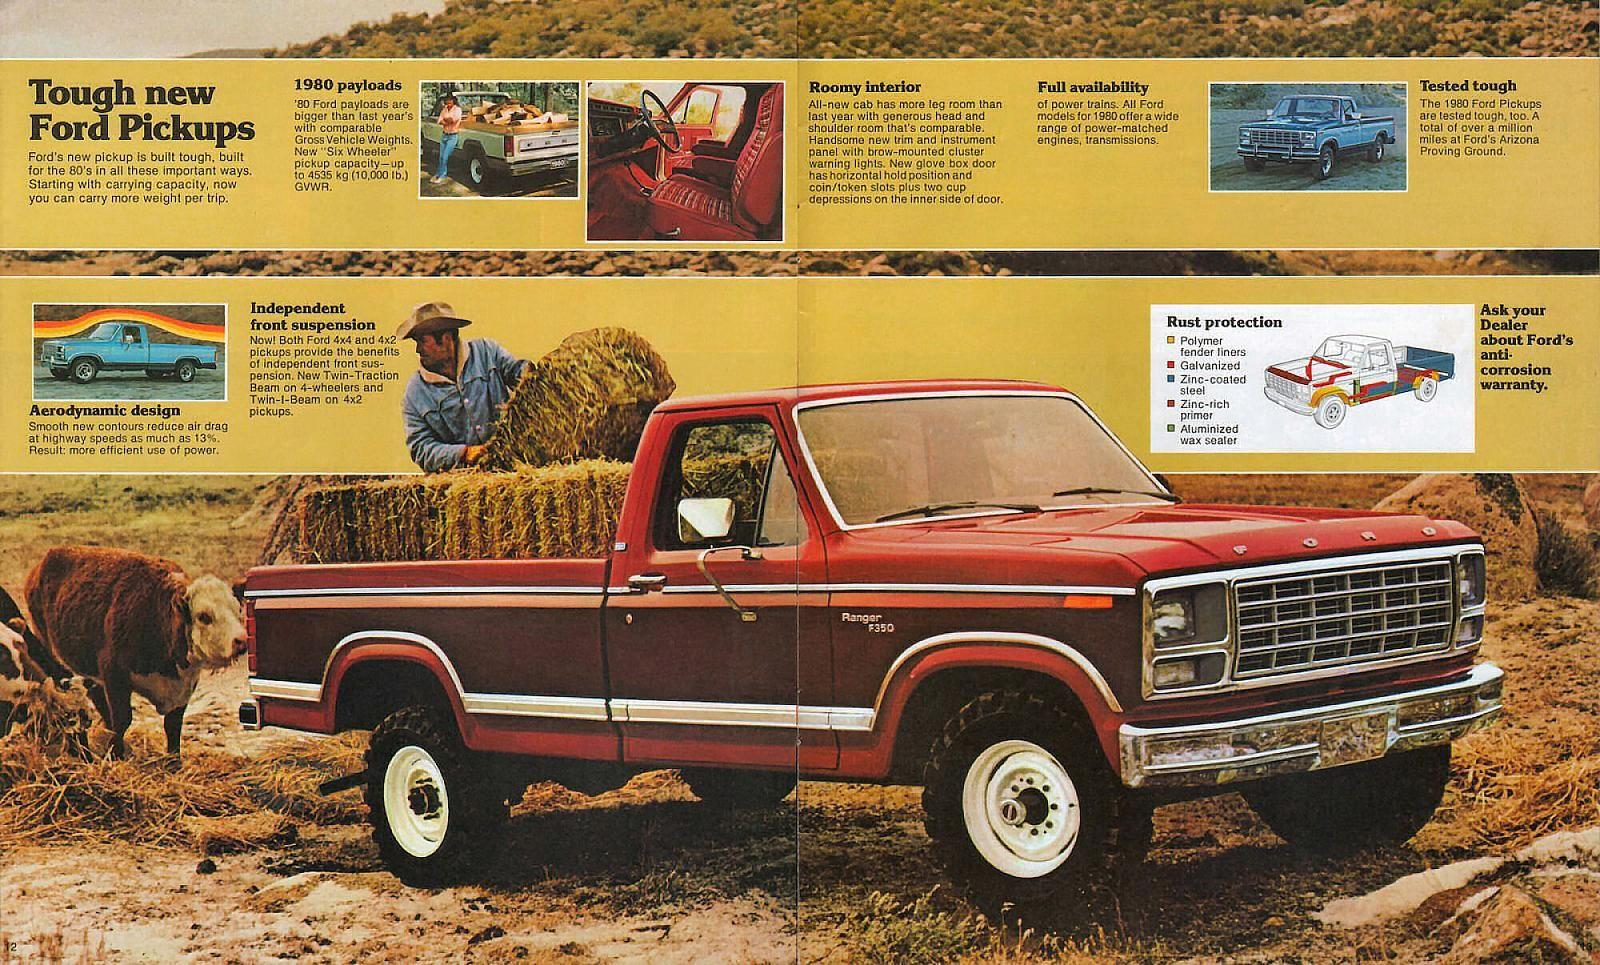 1980 Ford Pickup 12 13 Ford Pickup Ford Trucks Ford Truck